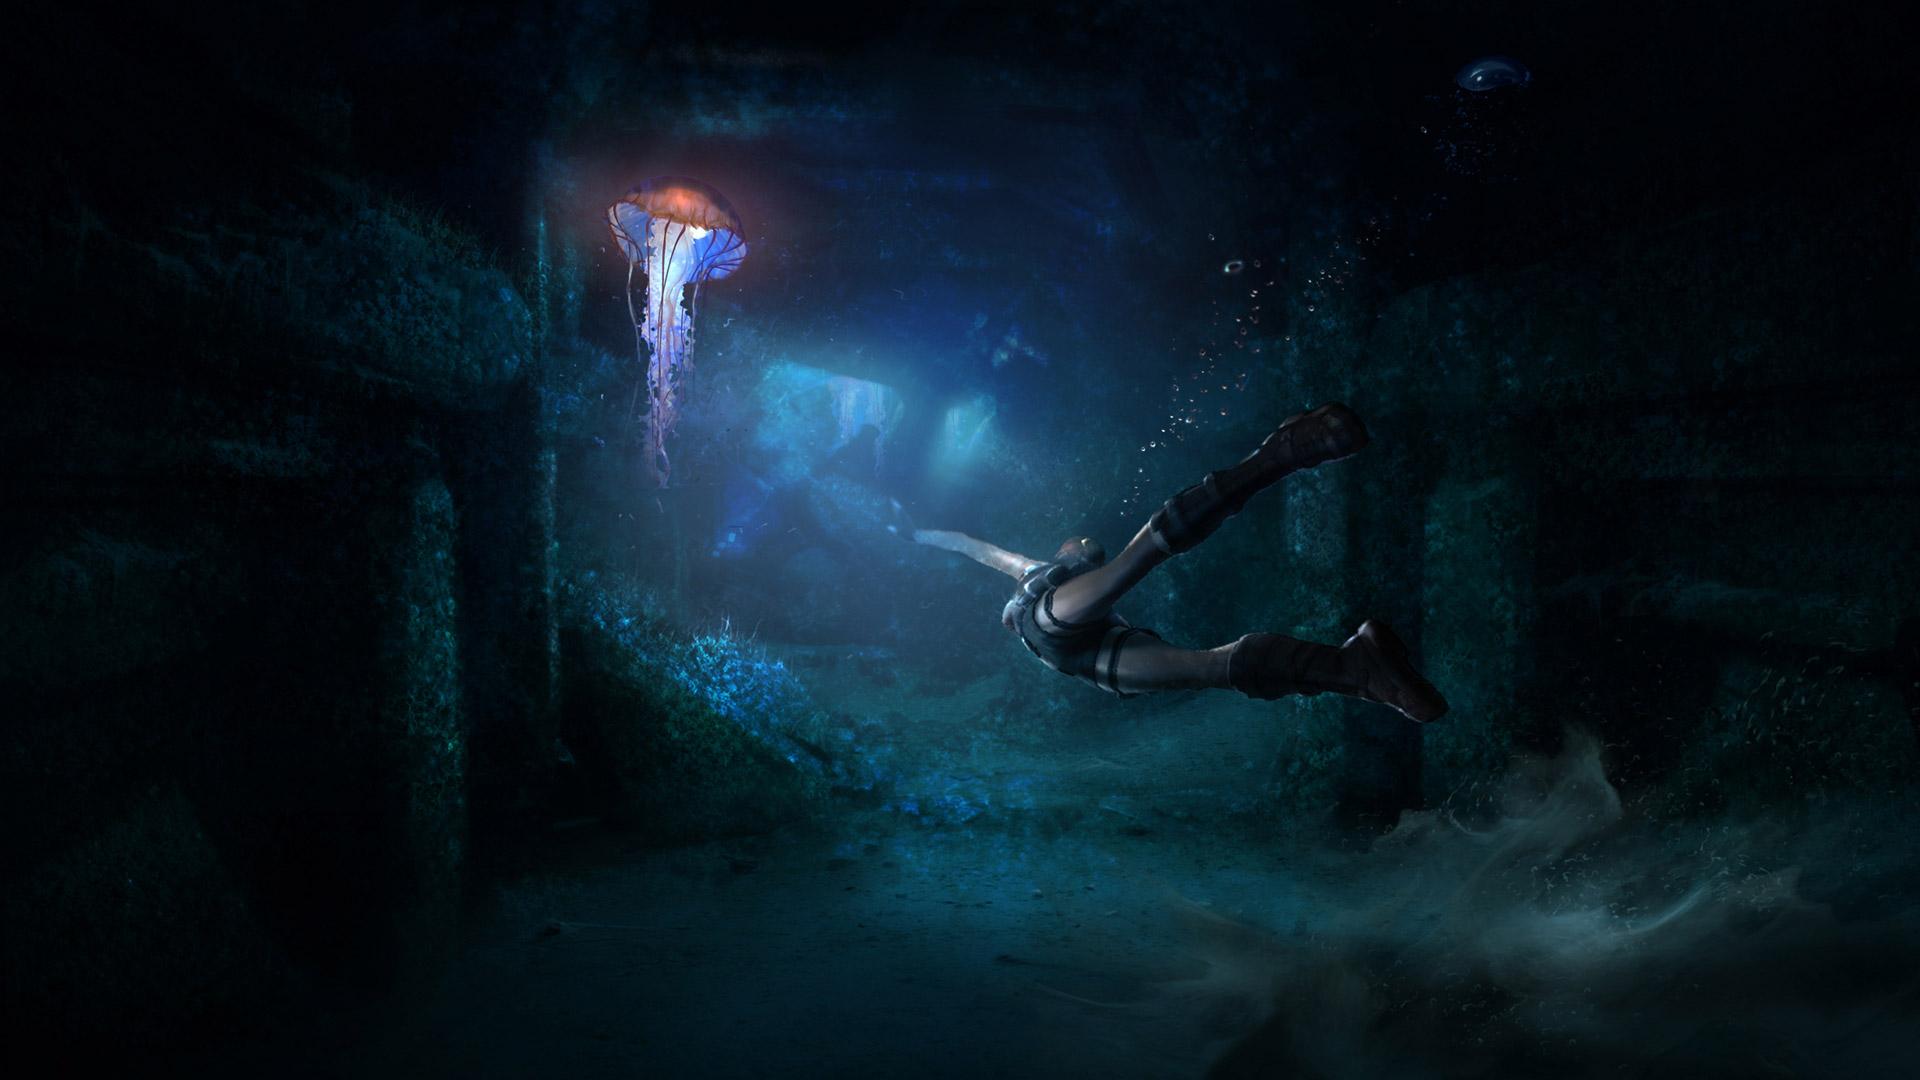 Free Tomb Raider: Underworld Wallpaper in 1920x1080